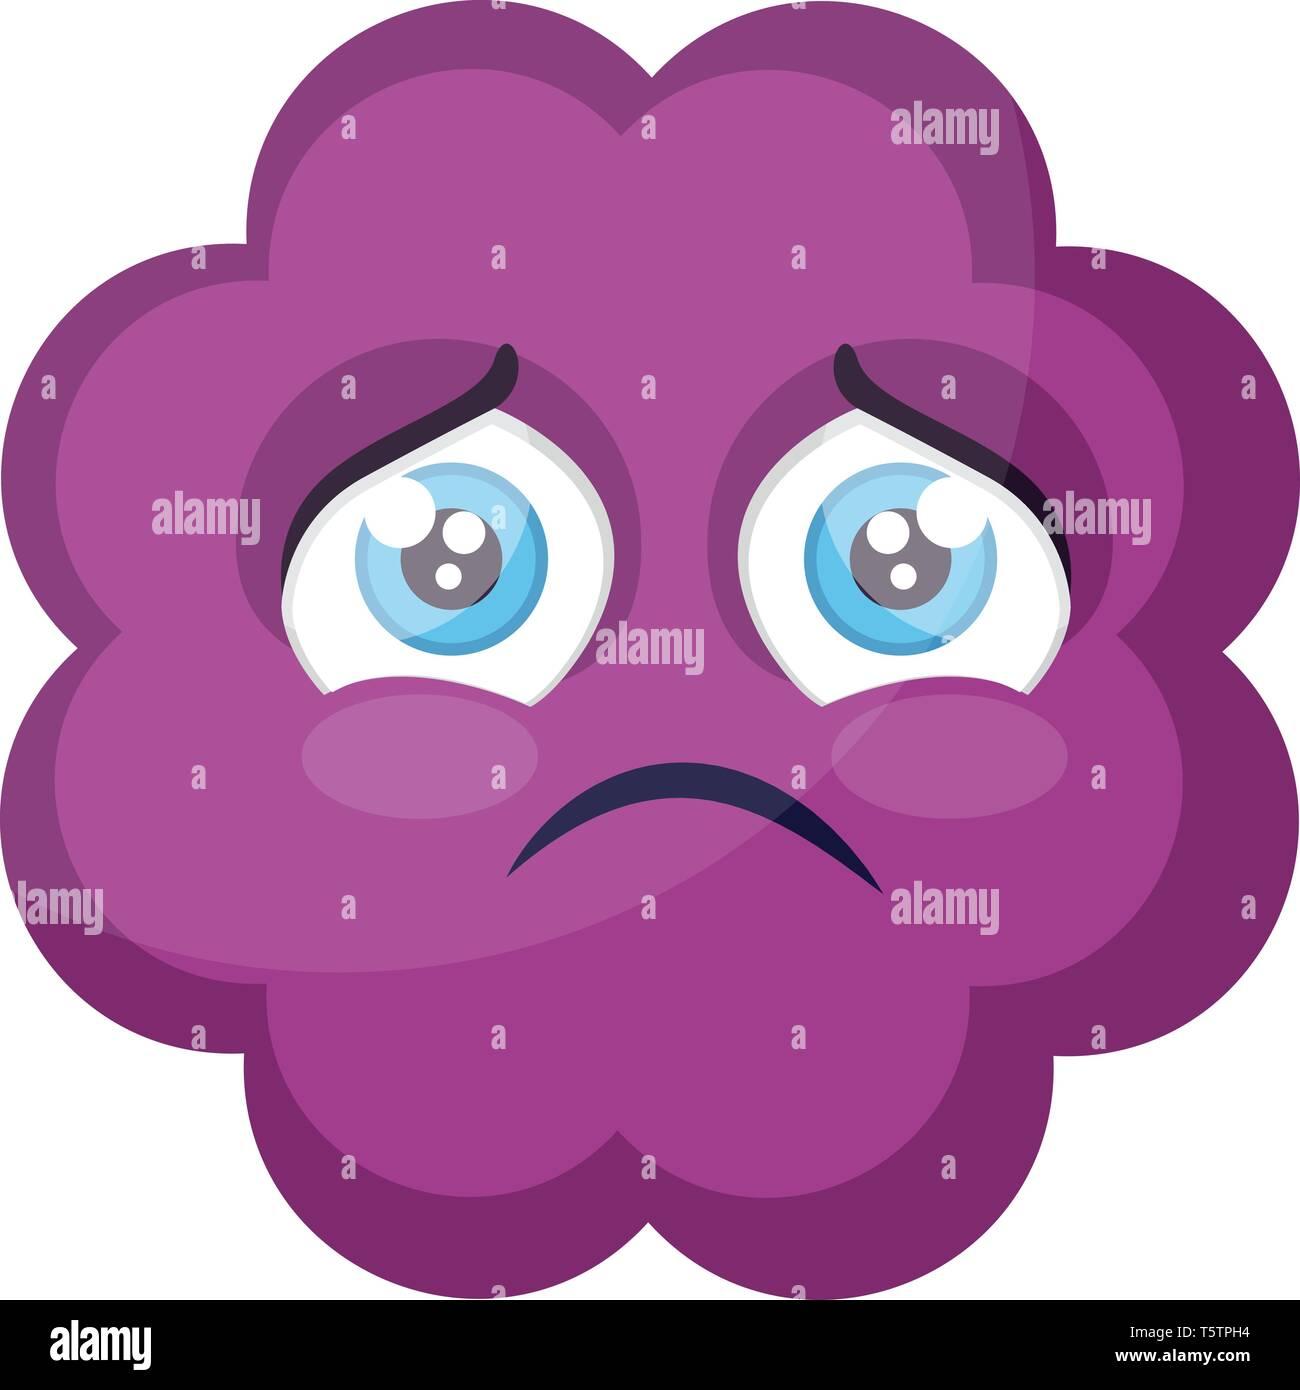 Sad purple cloud emoji face vector illustration on a white